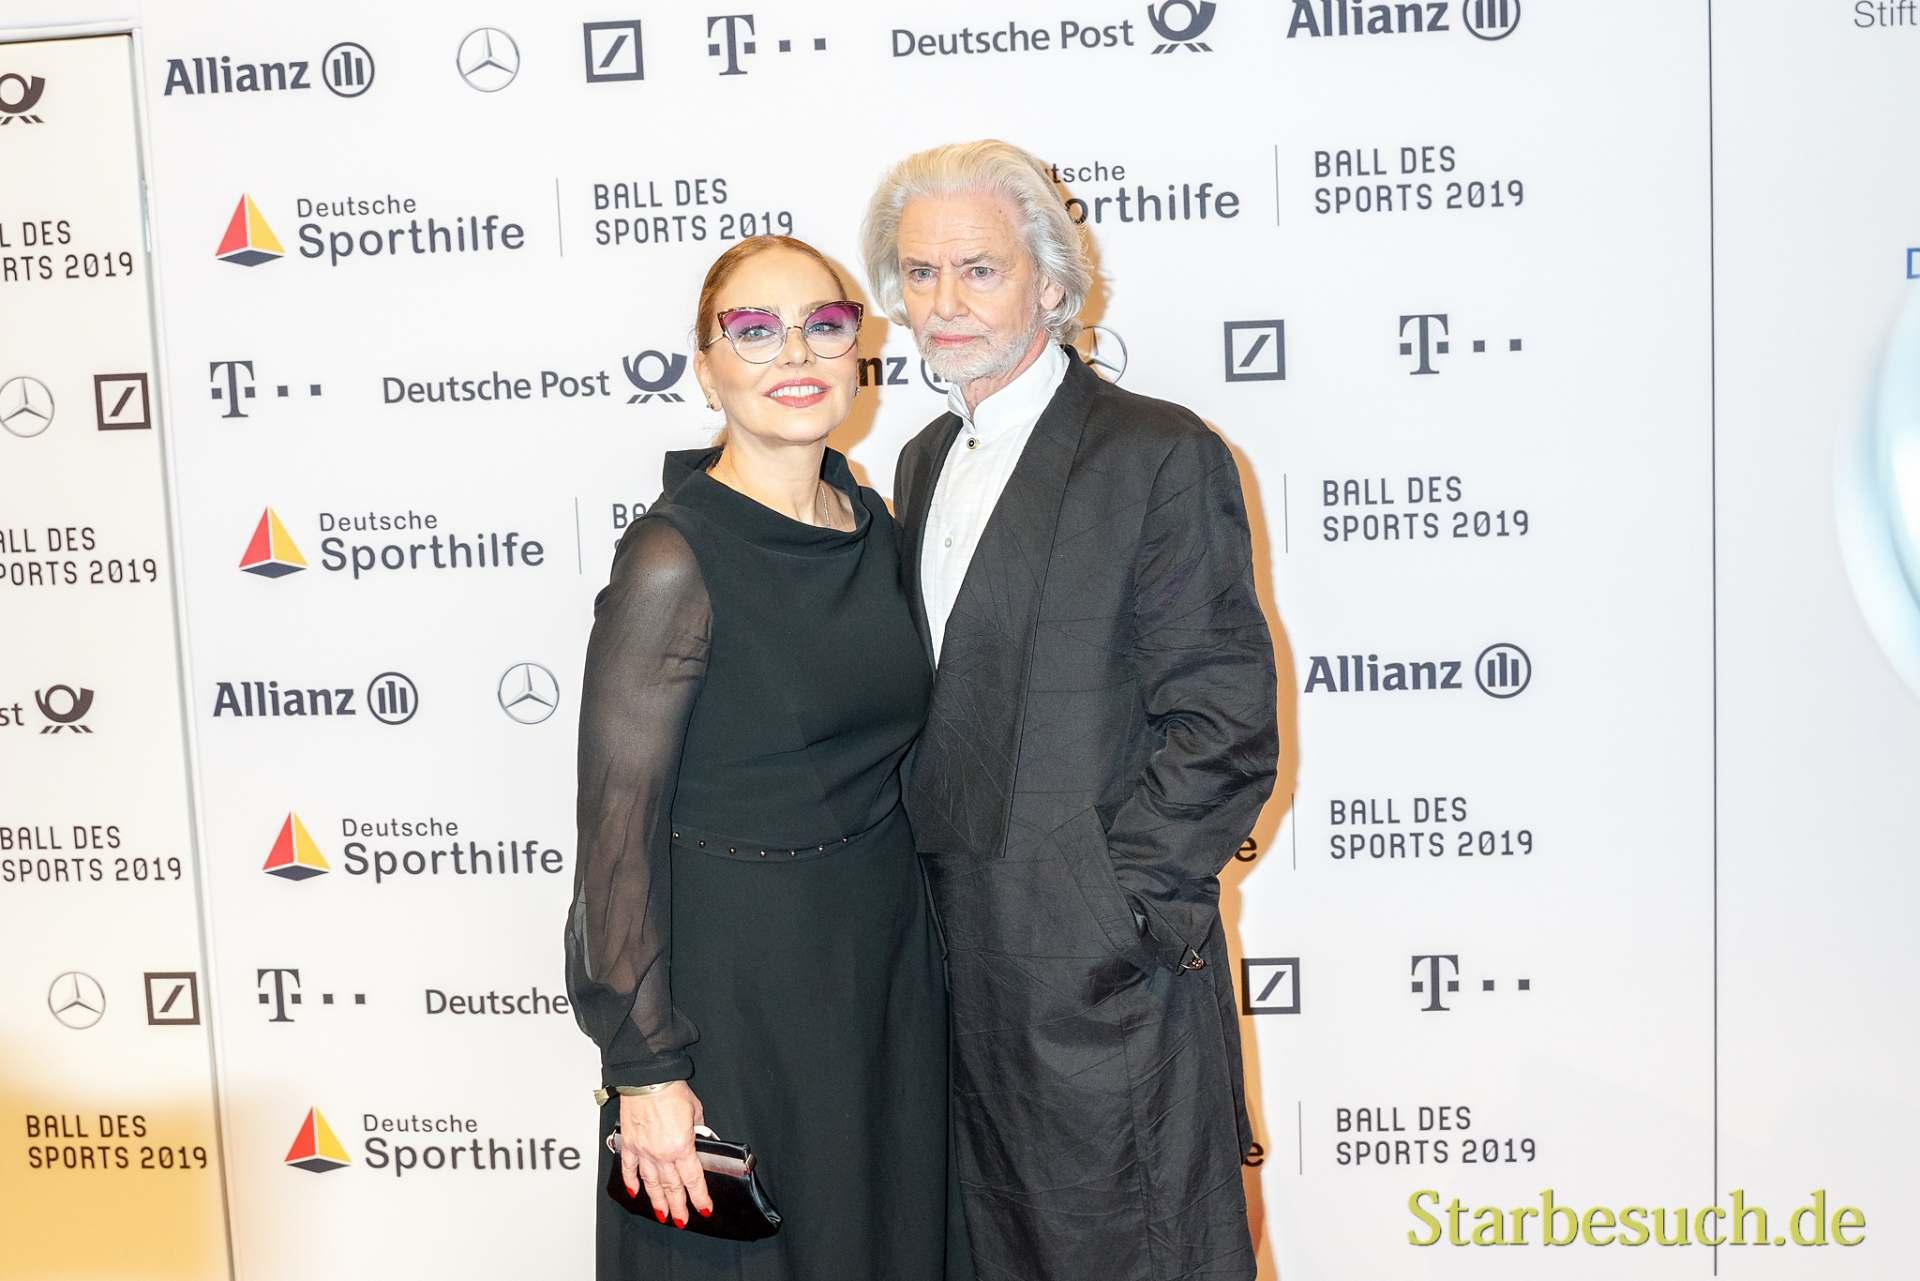 WIESBADEN, Germany - February 2nd, 2019: Ornella Muti and Hermann Bühlbecker at Ball des Sports 2019